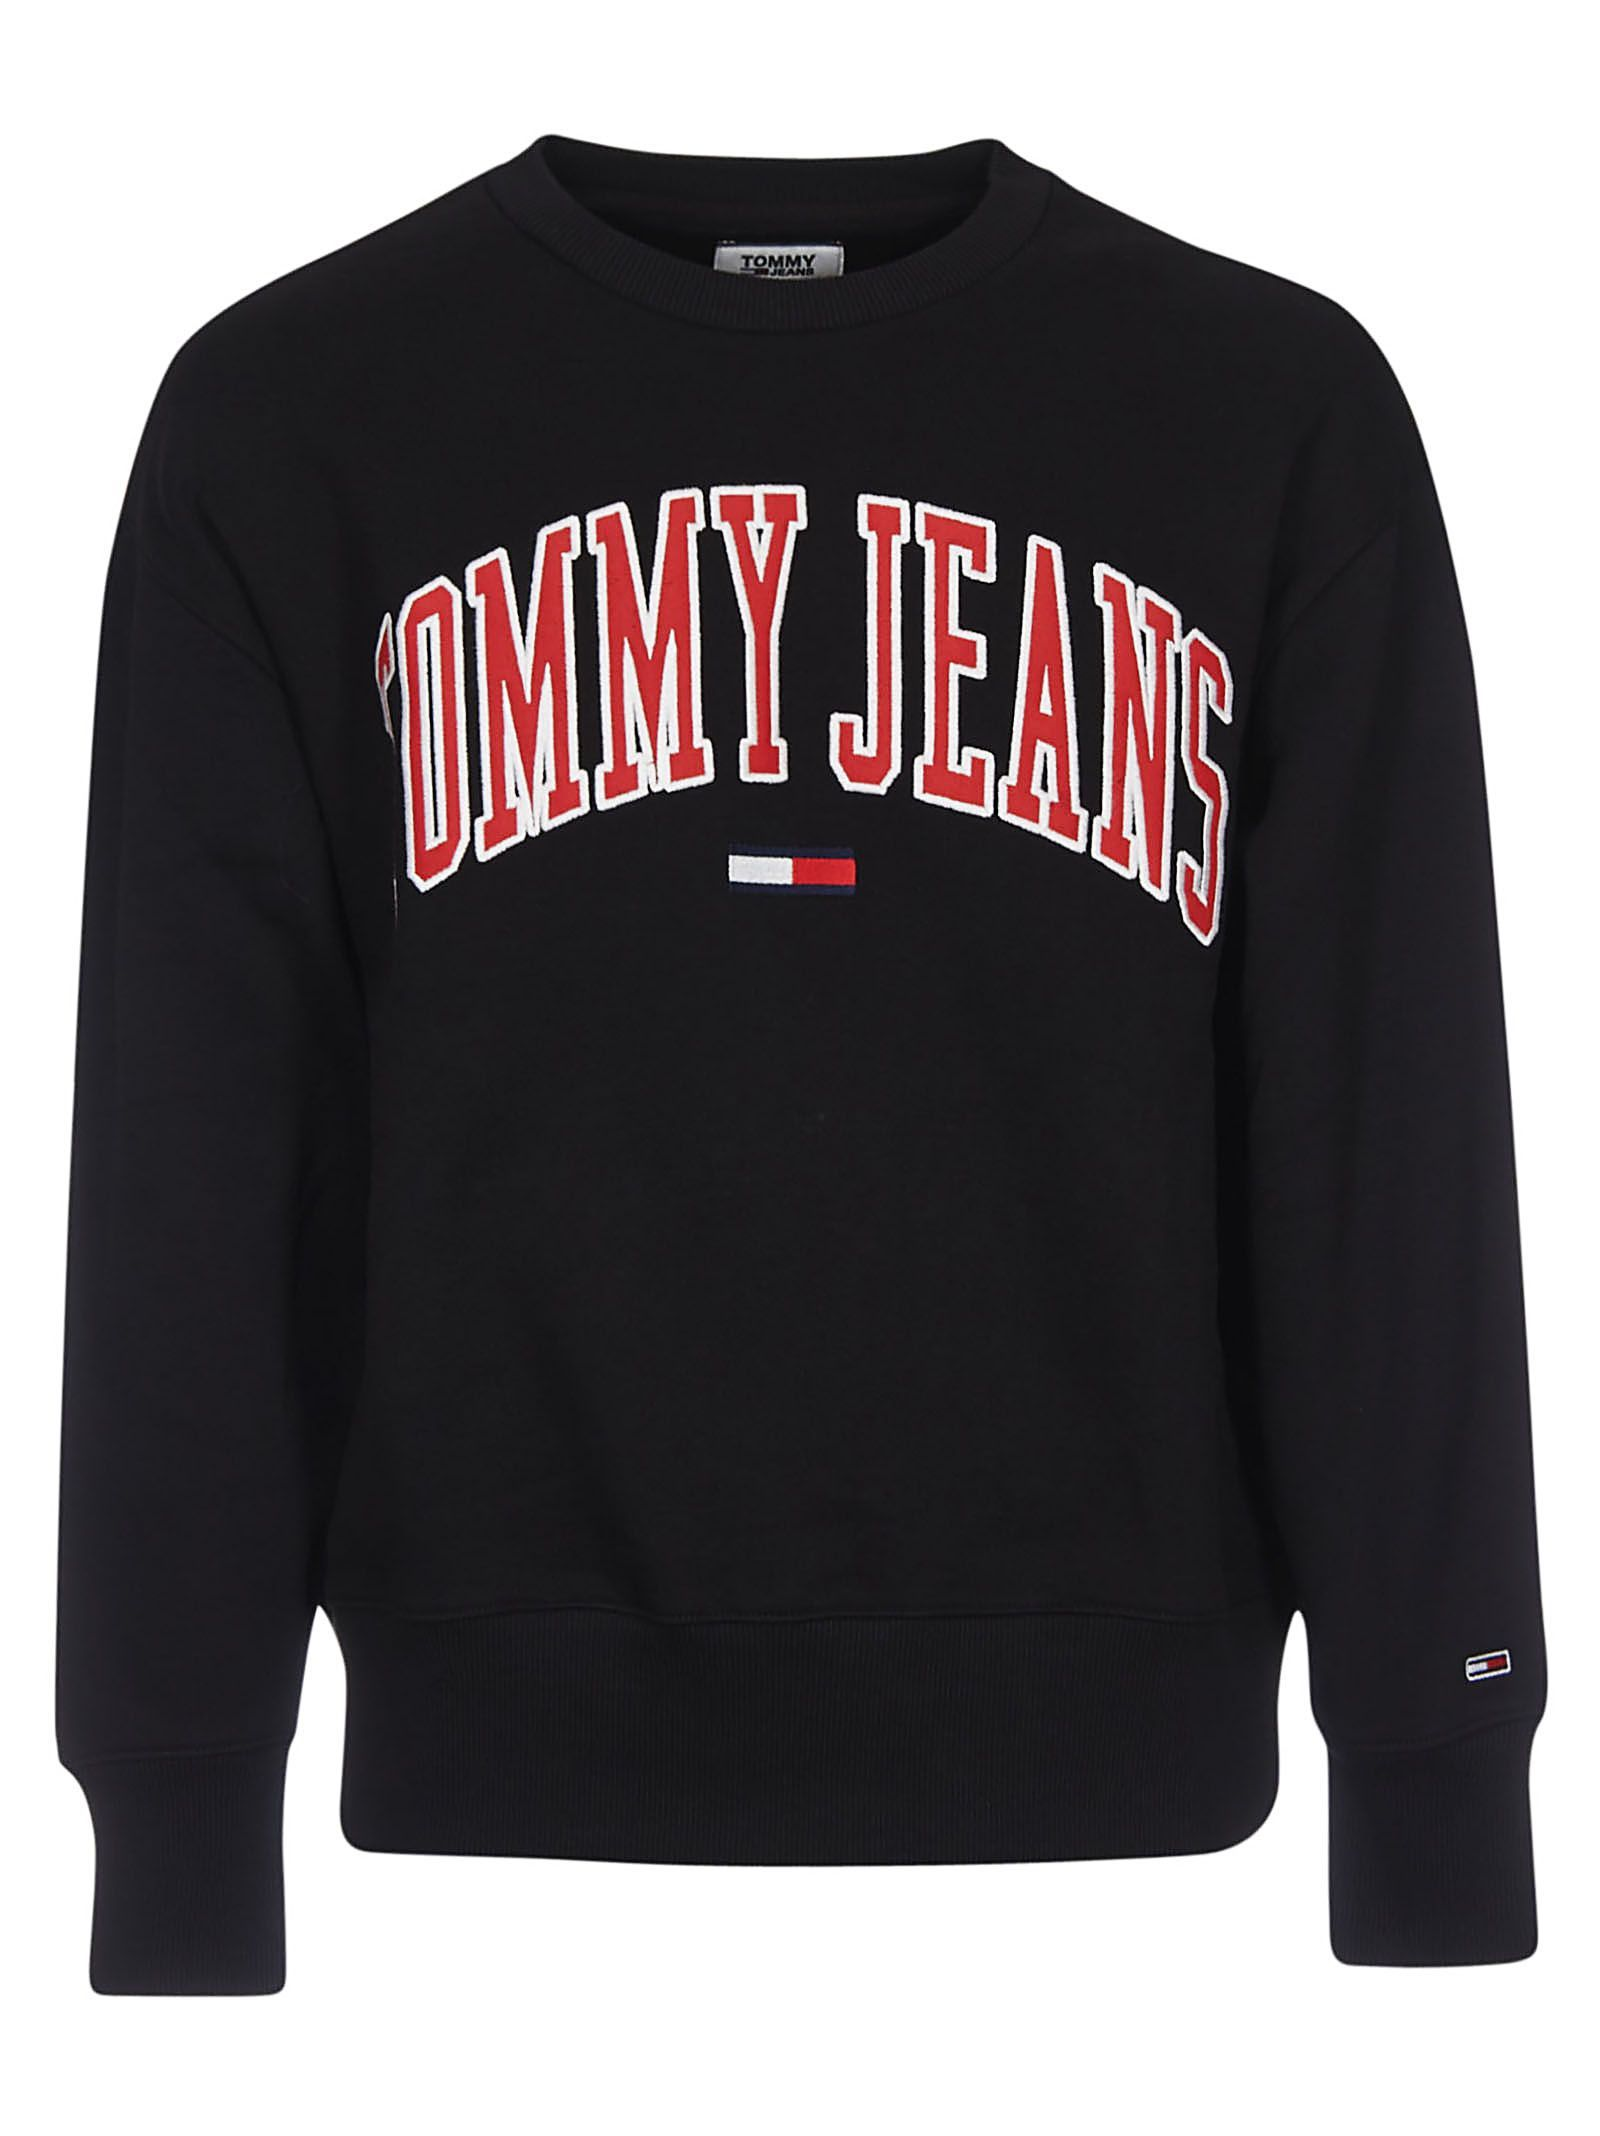 Tommy Hilfiger Tjm Clean Collegiate Sweatshirt Tommyhilfiger Cloth Tommy Hilfiger Outfit Sweatshirts Tommy Hilfiger Shirts [ 2136 x 1600 Pixel ]